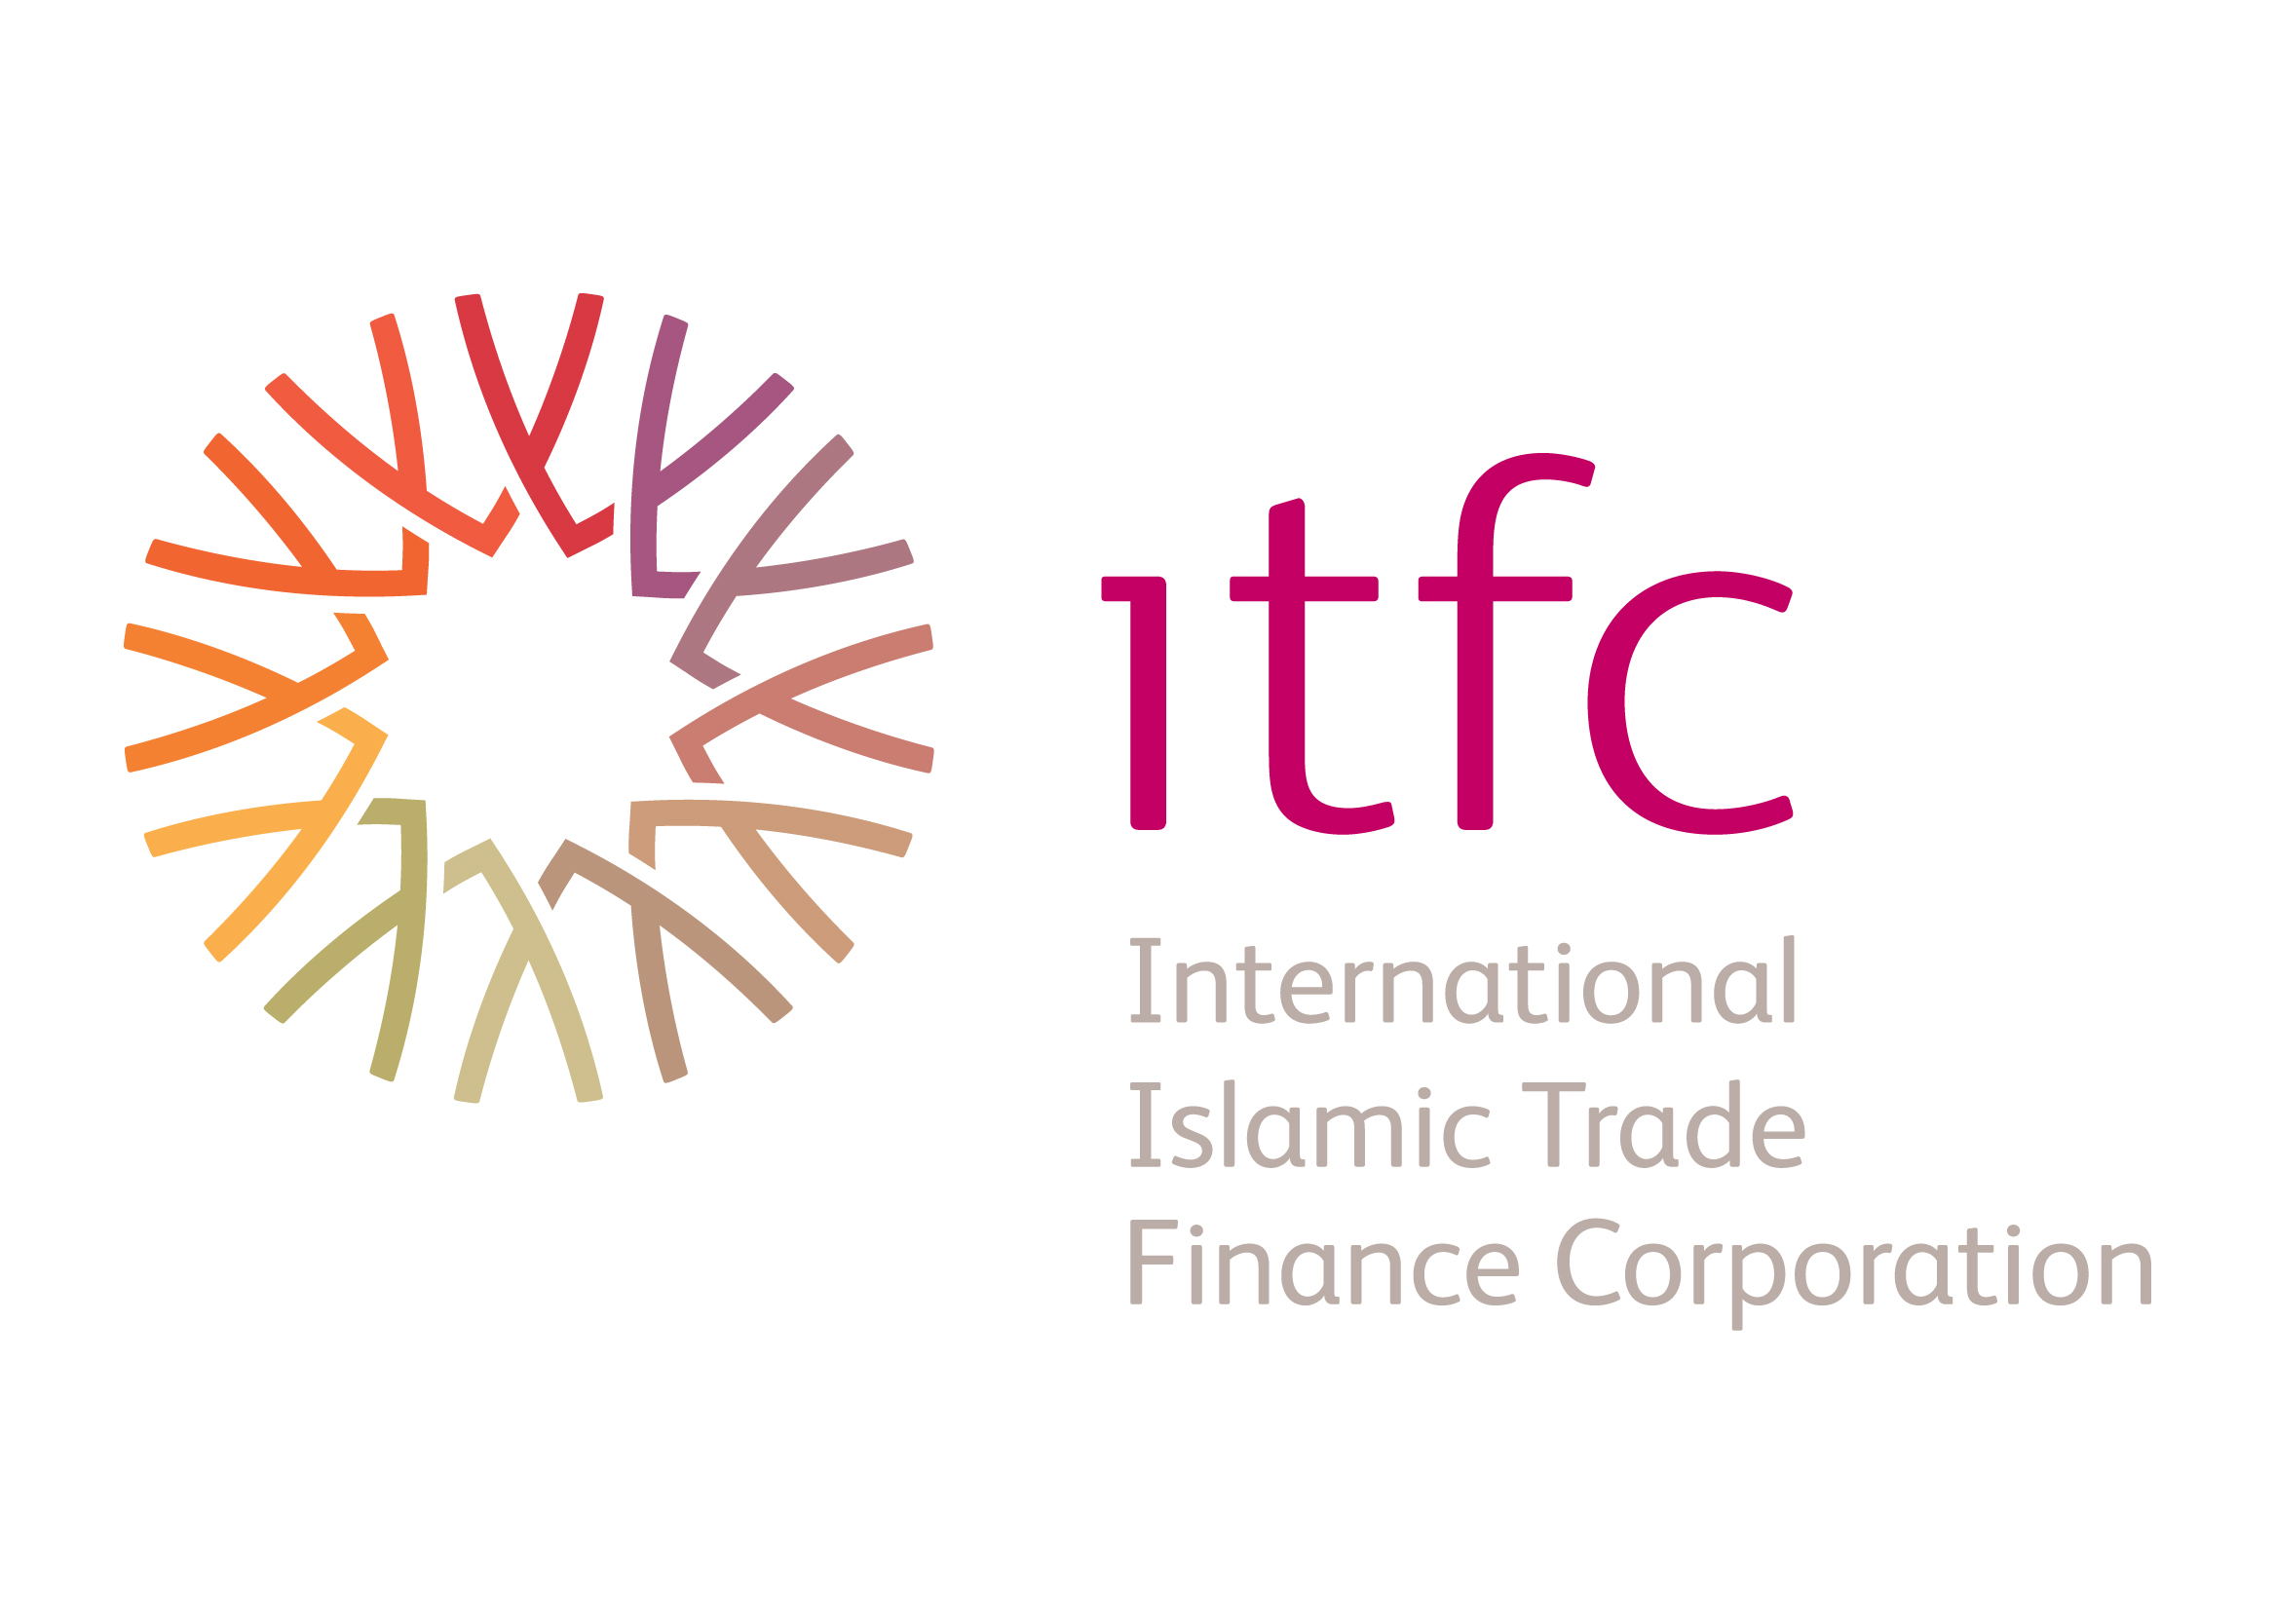 International Islamic Trade Finance Corporation